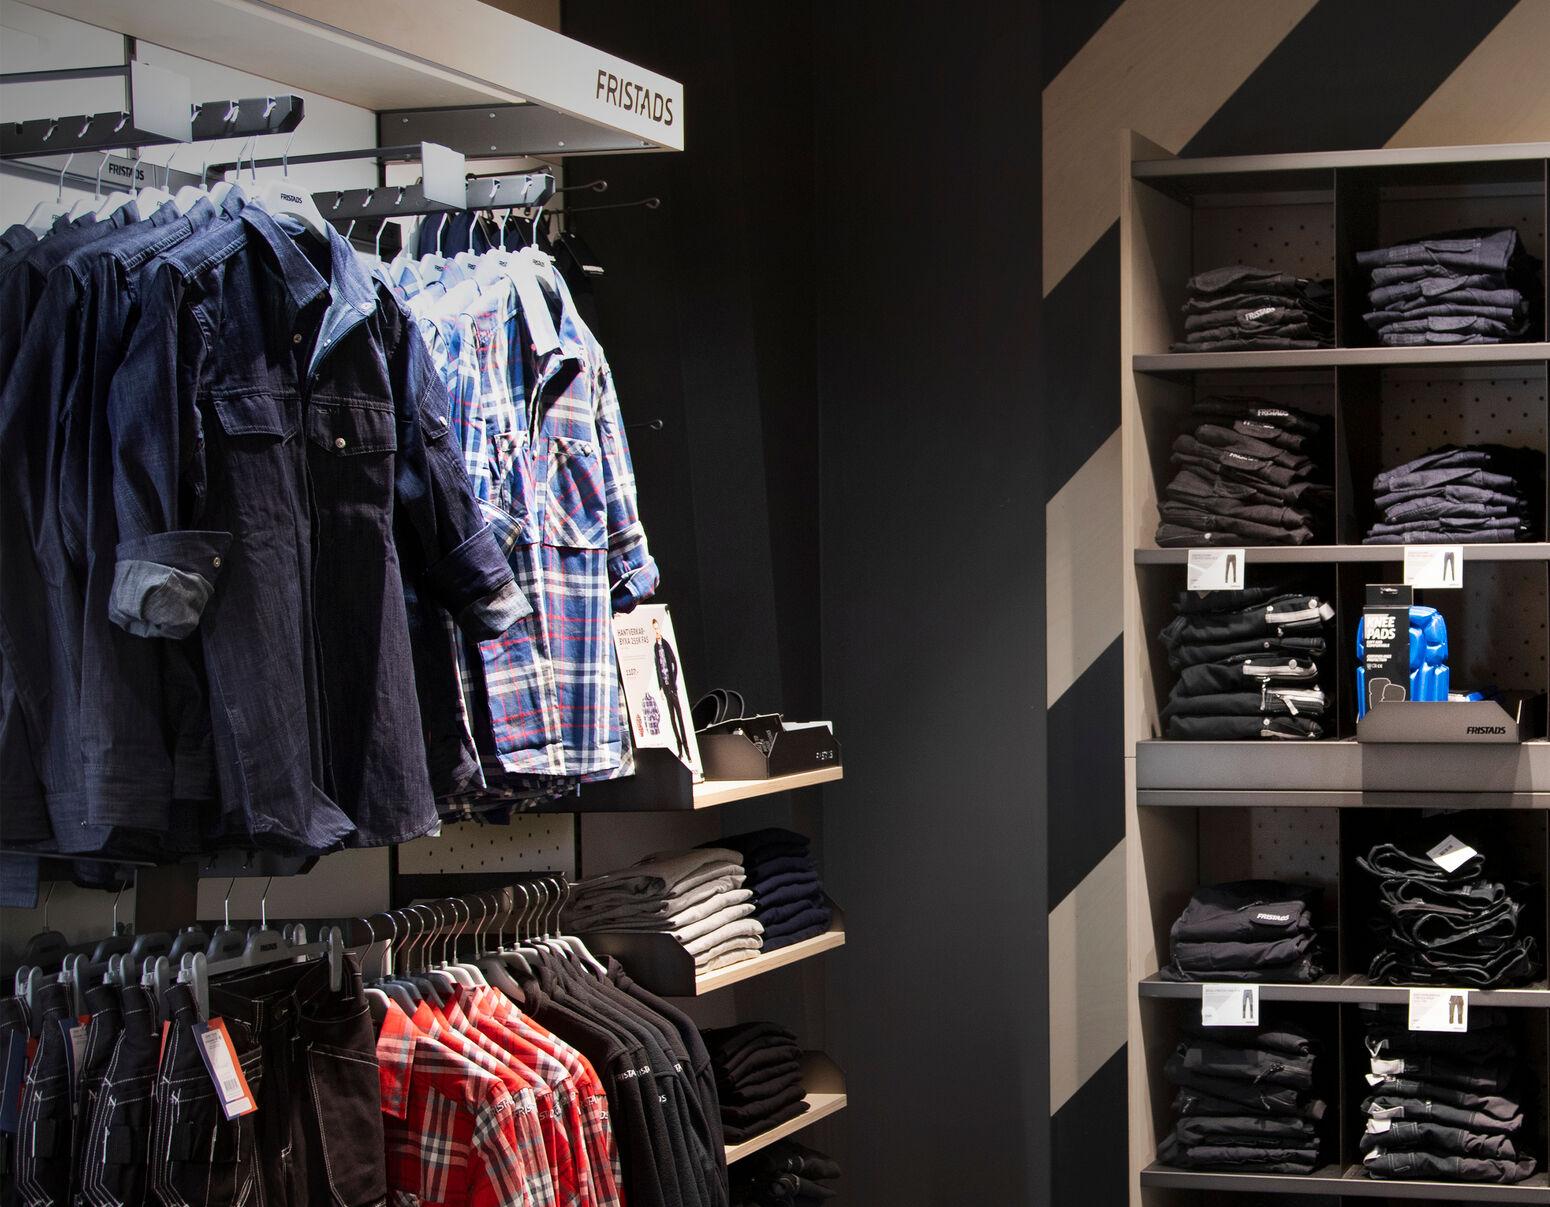 fristads_workwear_shop_in_shop_mobile